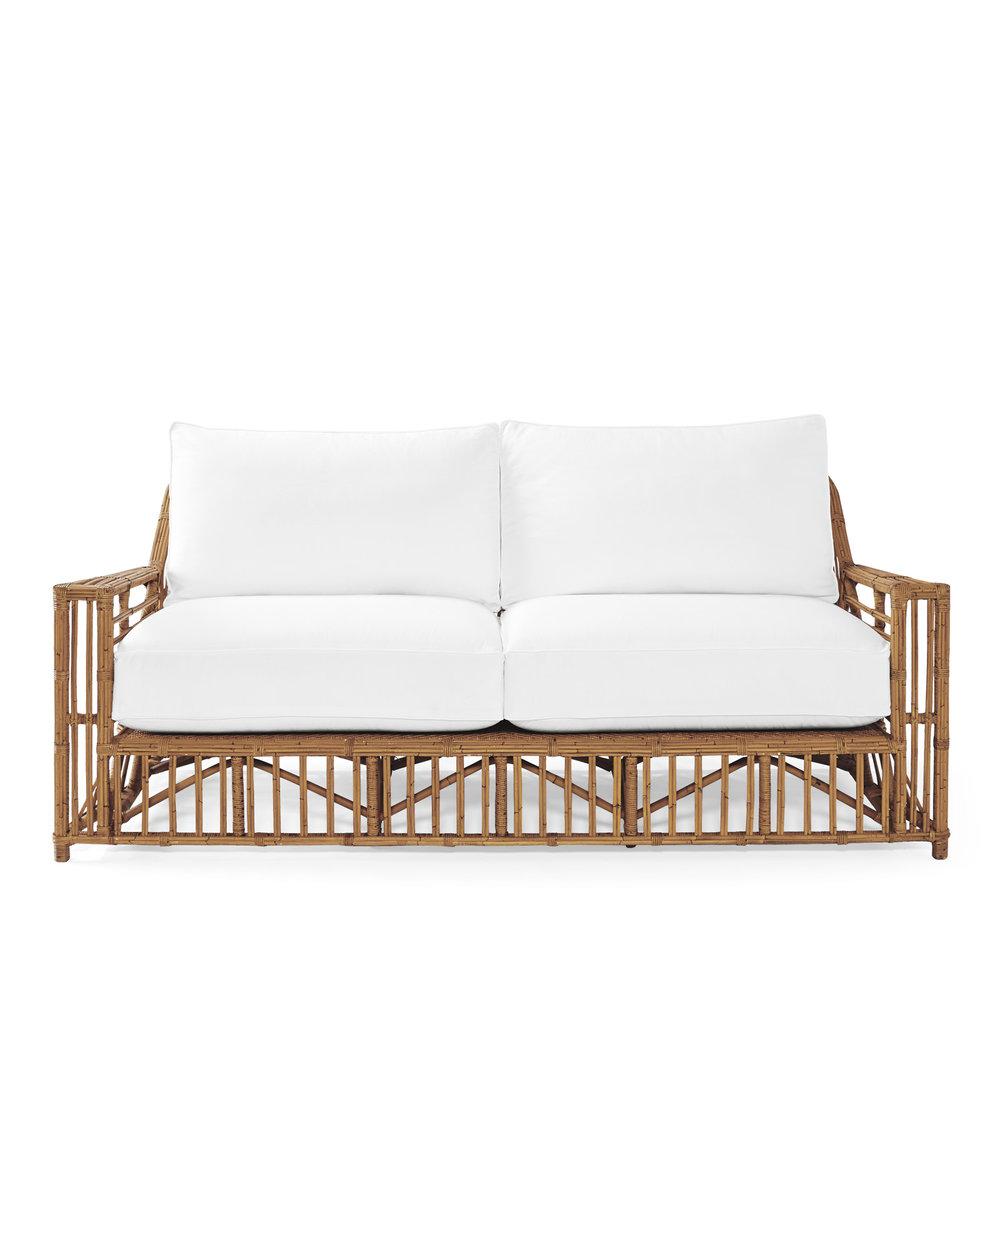 bungalow sofa / $1699